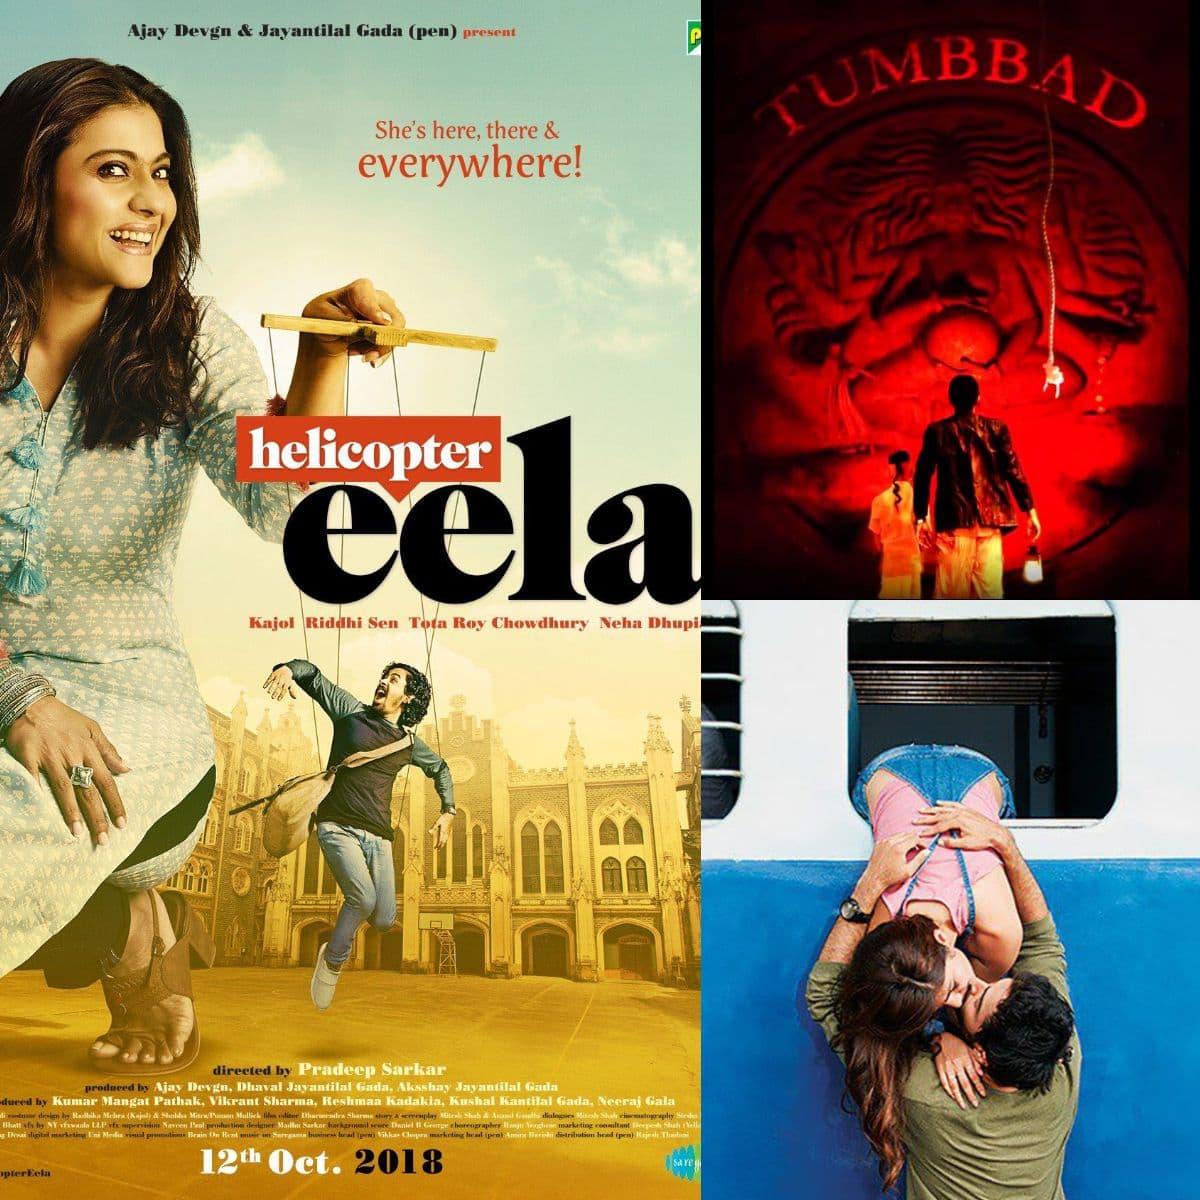 Movies This Week Helicopter Eela Tumbadd Jalebi Bollywood News